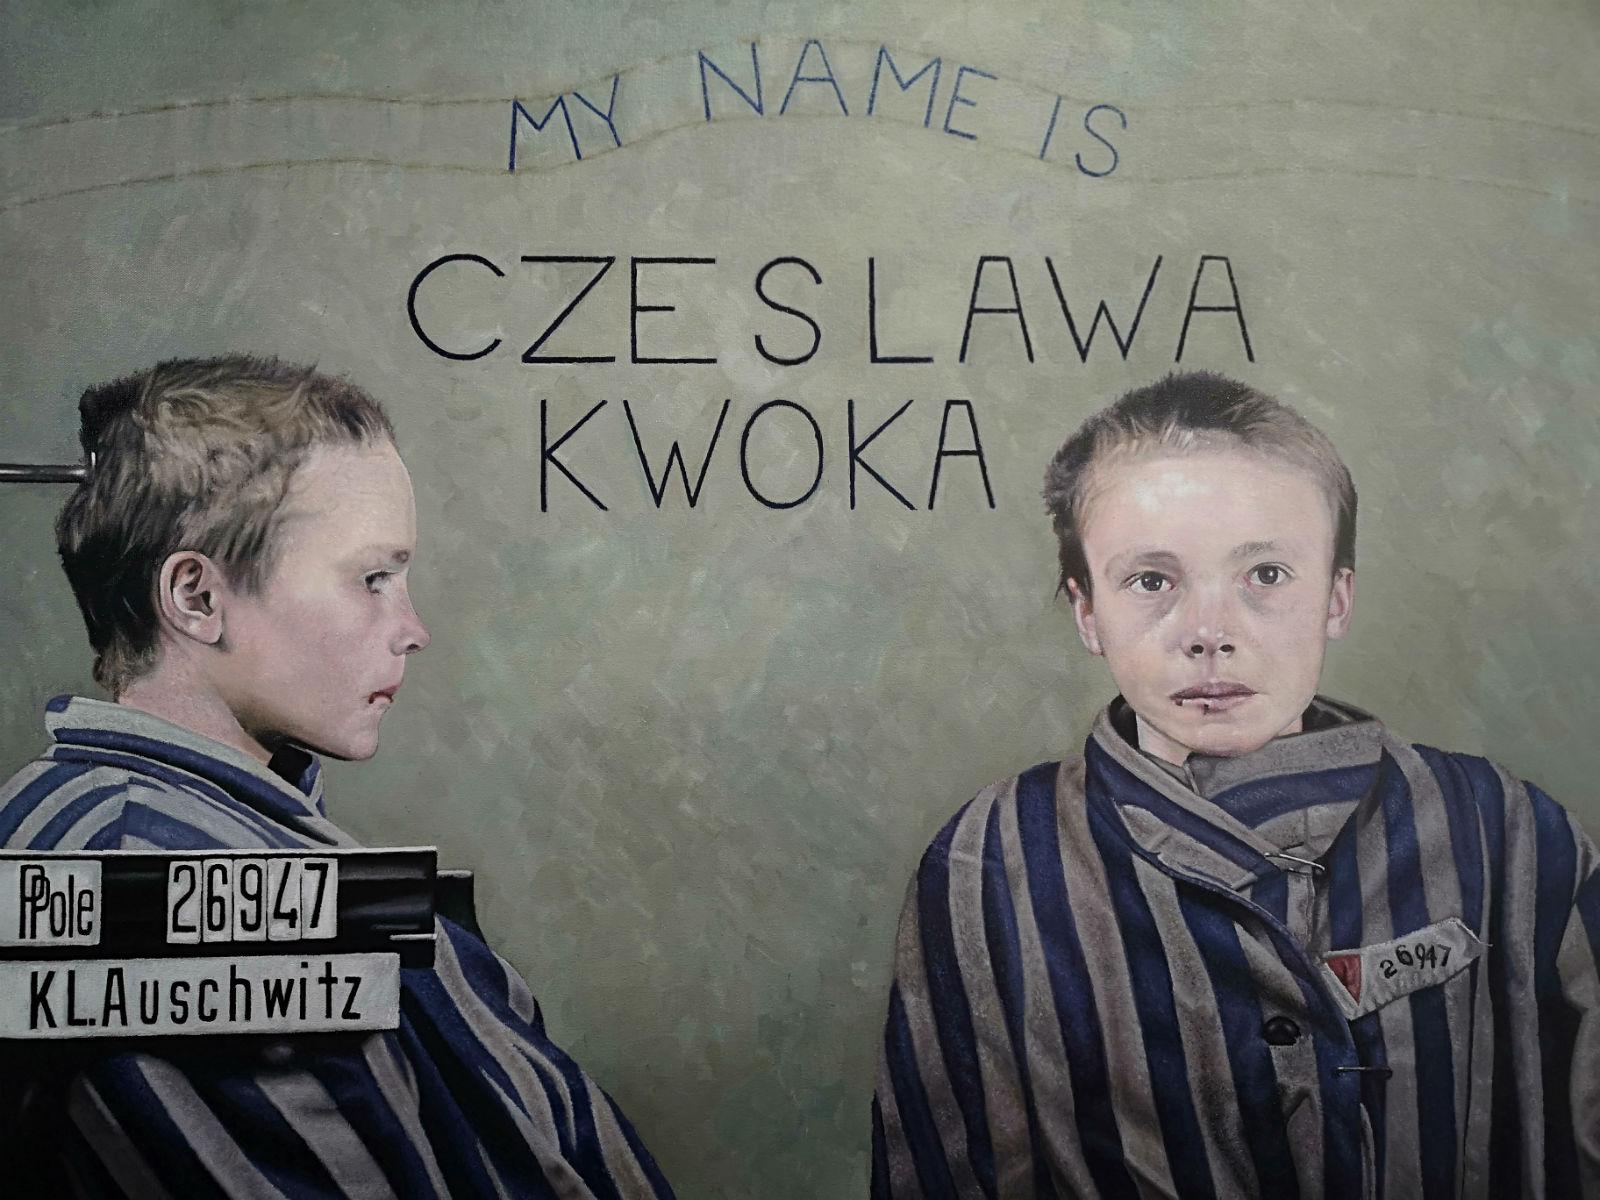 Czeslawa Kwoka original oil painting by James earley